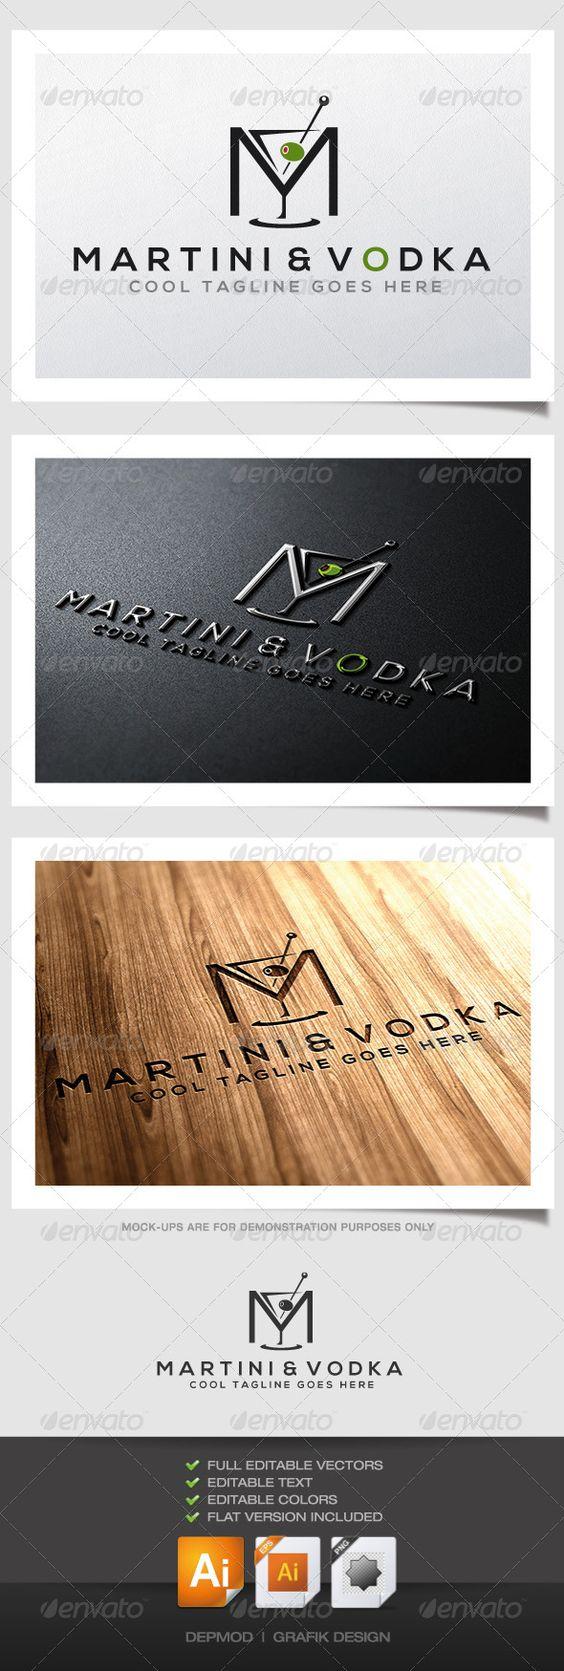 Martini & Vodka - Logo Design Template Vector #logotype Download it here: http://graphicriver.net/item/martini-vodka-logo/4577682?s_rank=893?ref=nexion